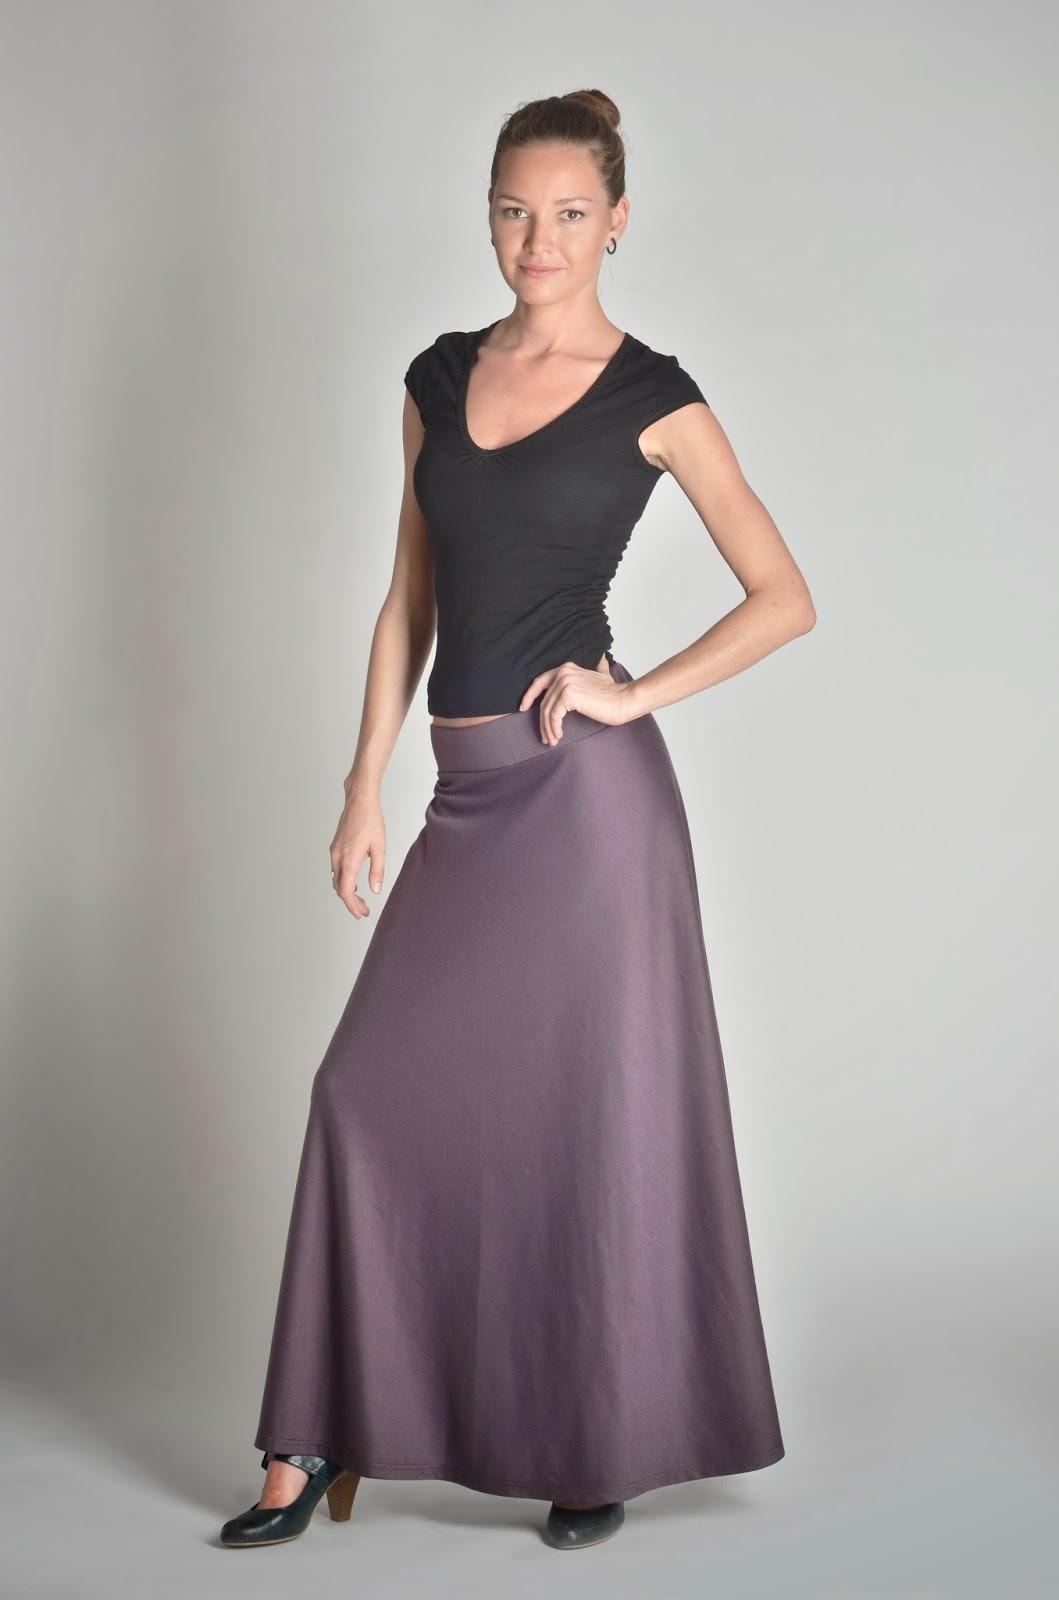 Трикотажная юбка с одним швом